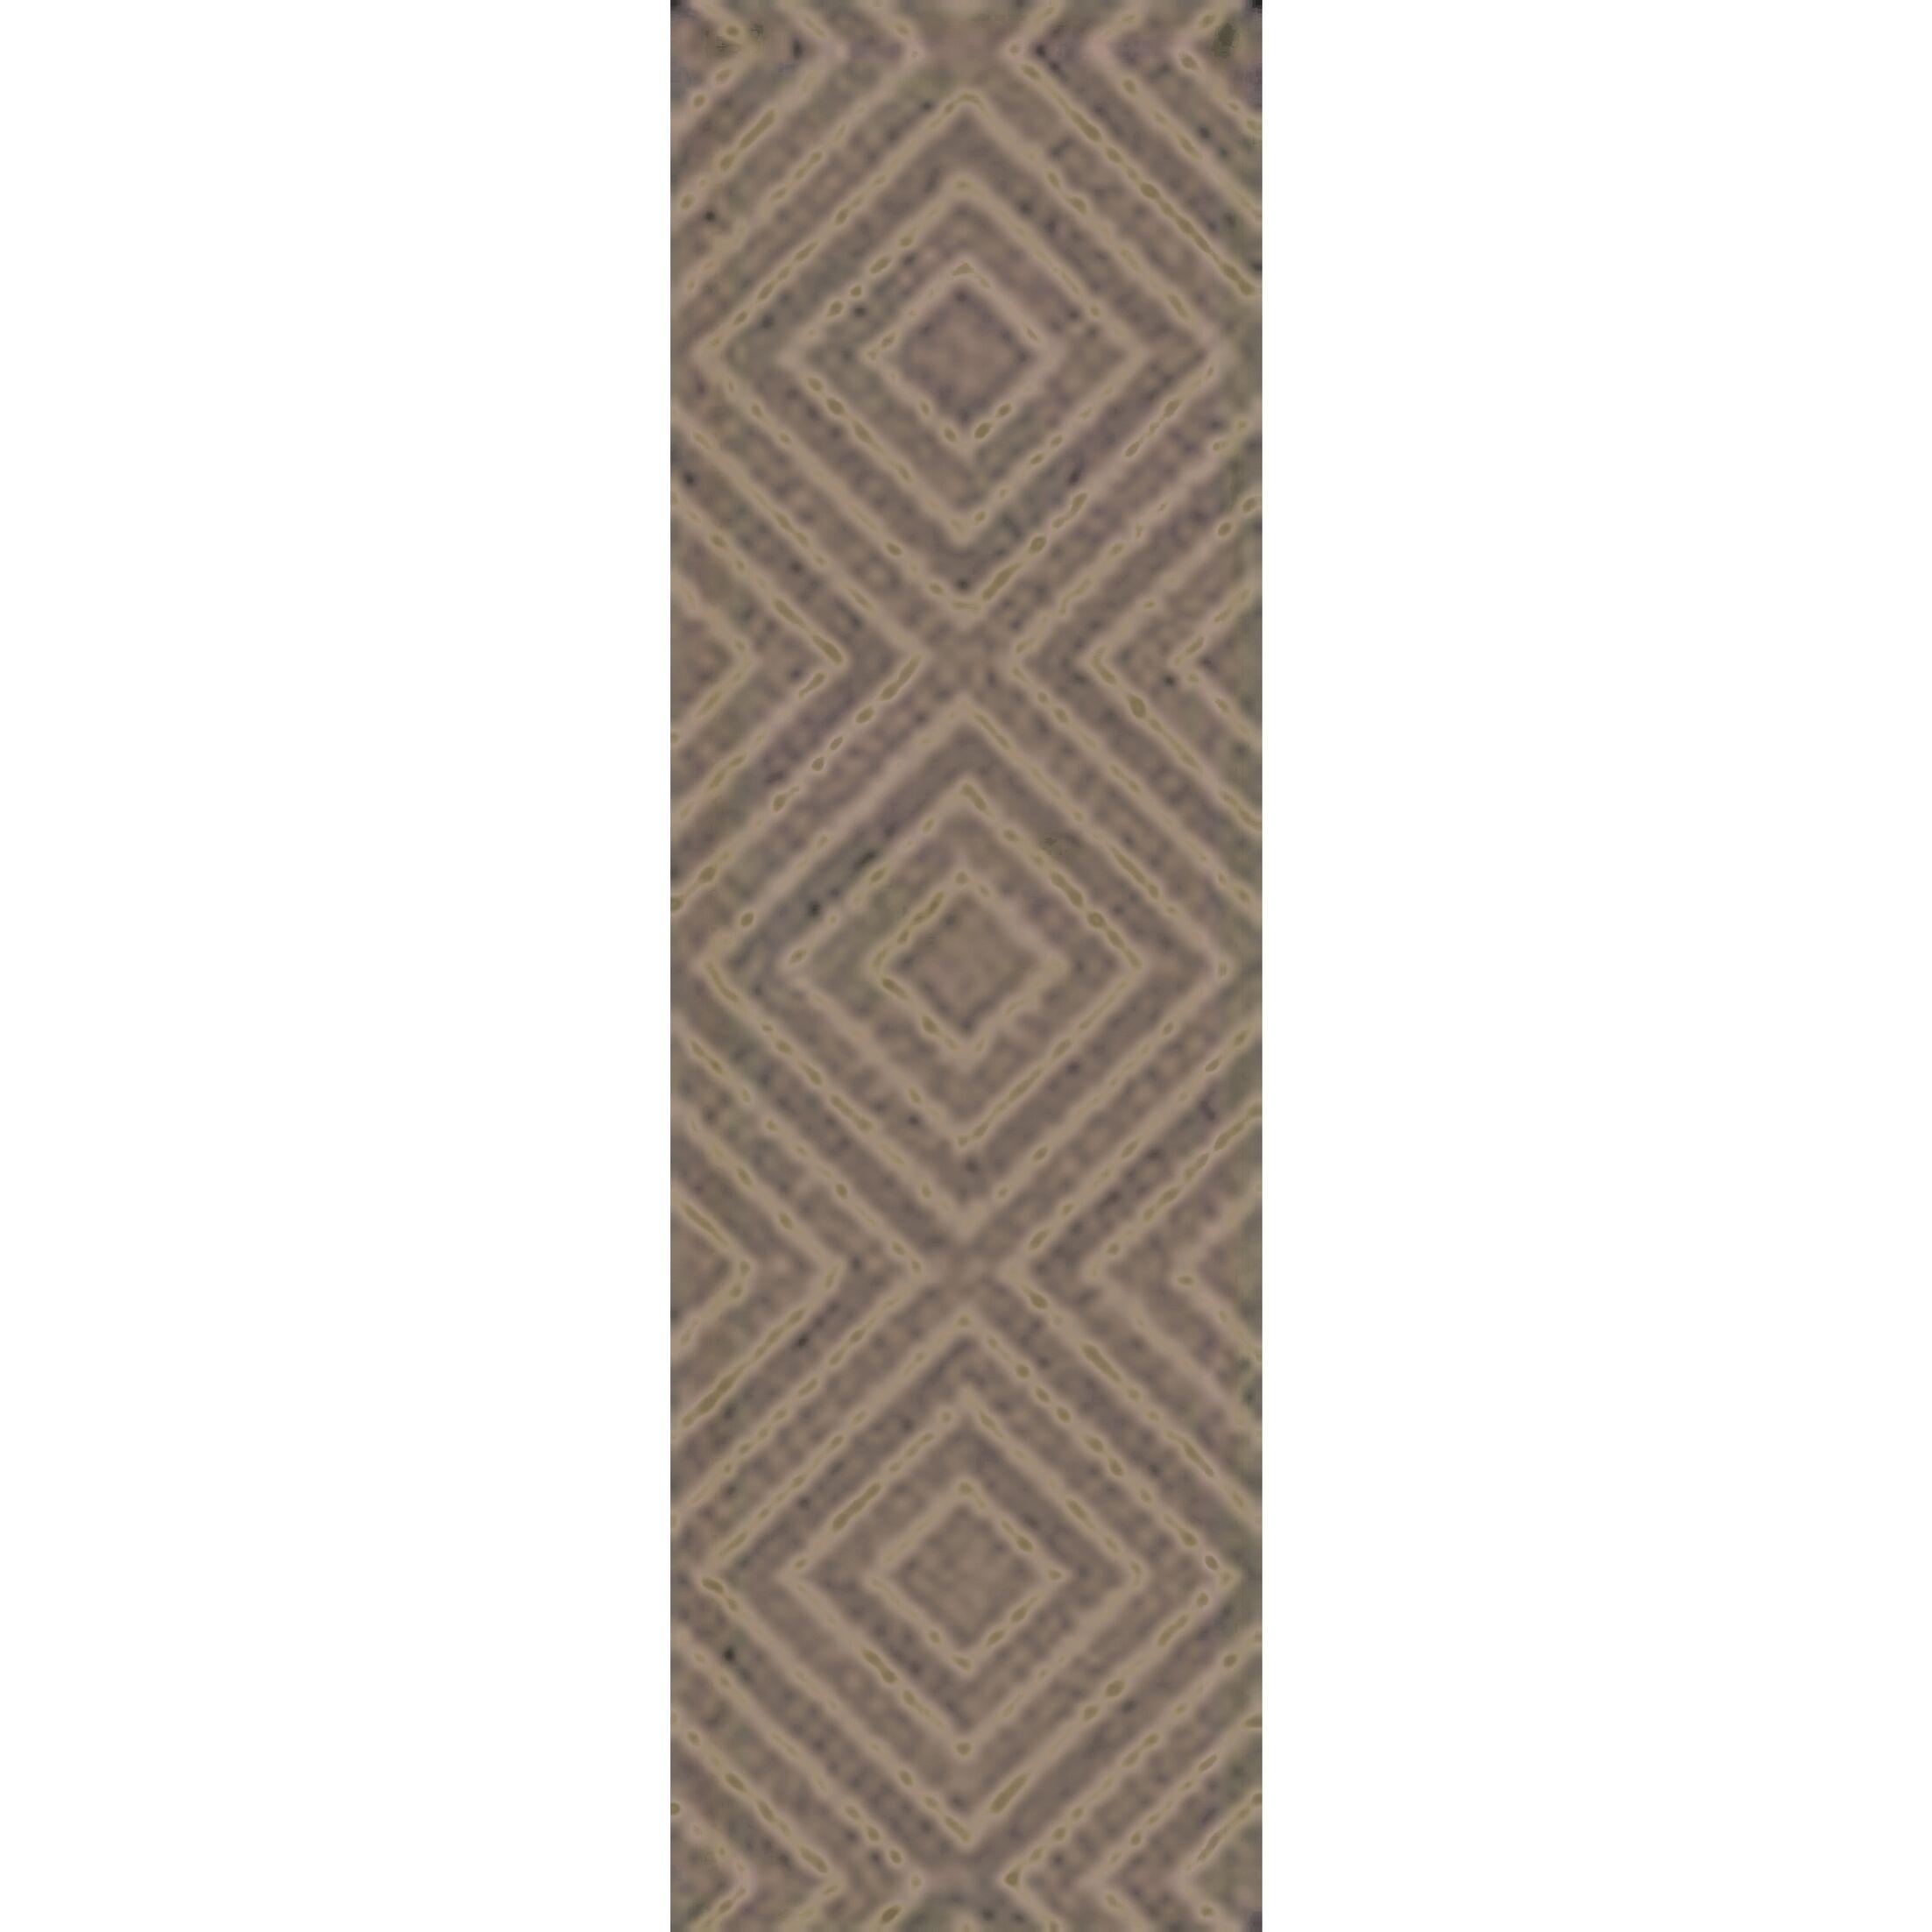 Berkeley Hand-Hooked Taupe/Black Area Rug Rug Size: Runner 2'6